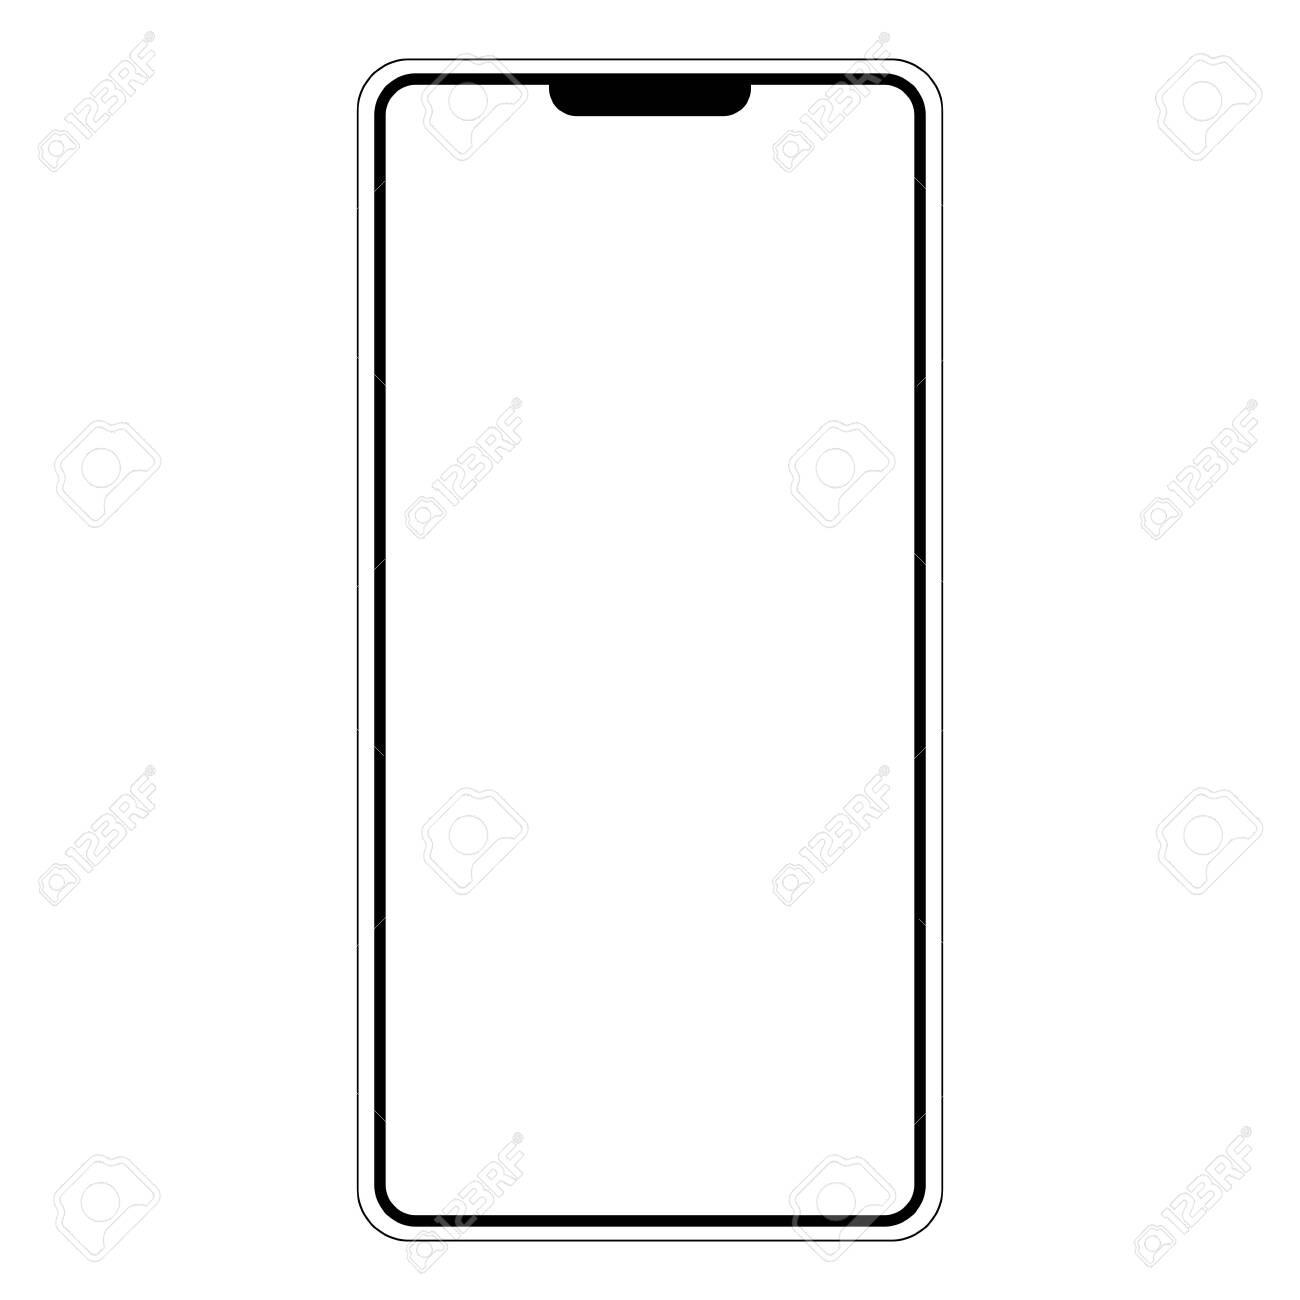 Silhouette shape mobile phone smartphone I am, vector shape I am smartphone mobile phone - 135702215